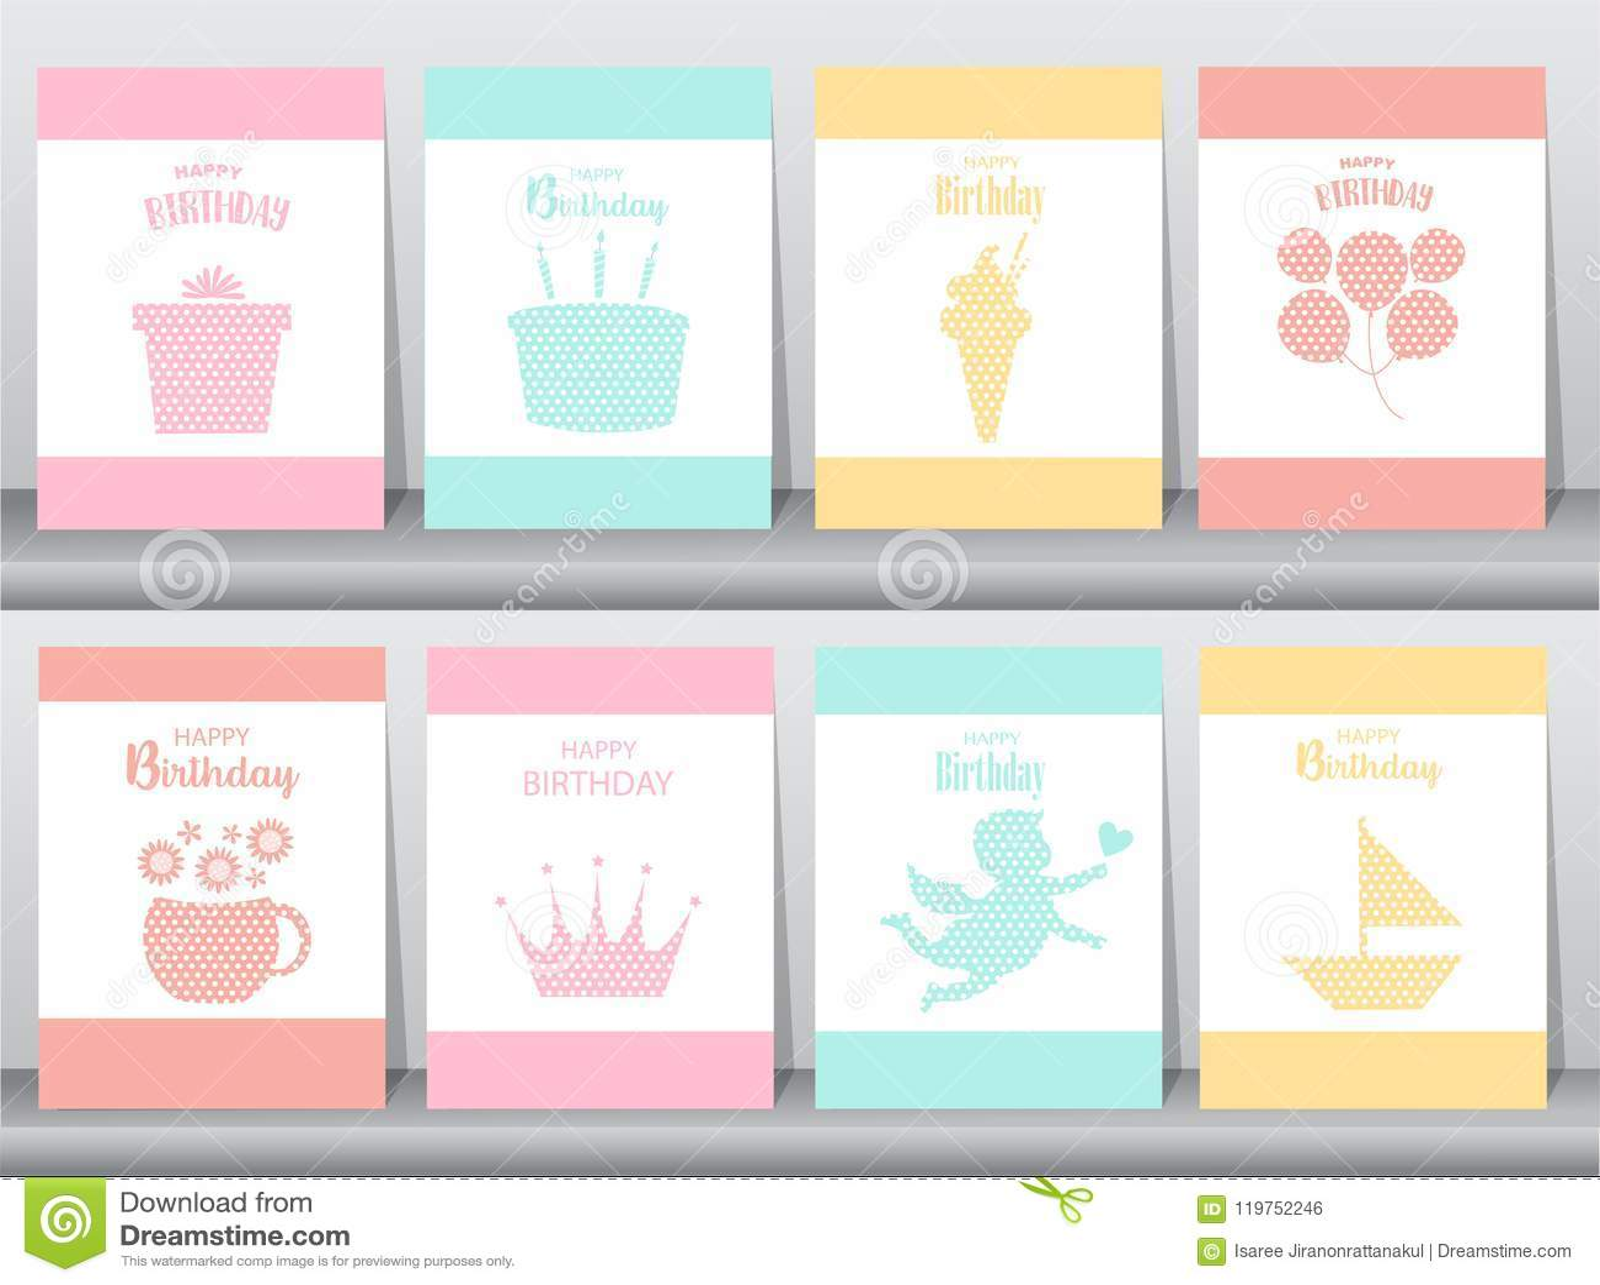 Set of birthday invitations on paper cards poster greeting download set of birthday invitations on paper cards poster greeting template animals filmwisefo